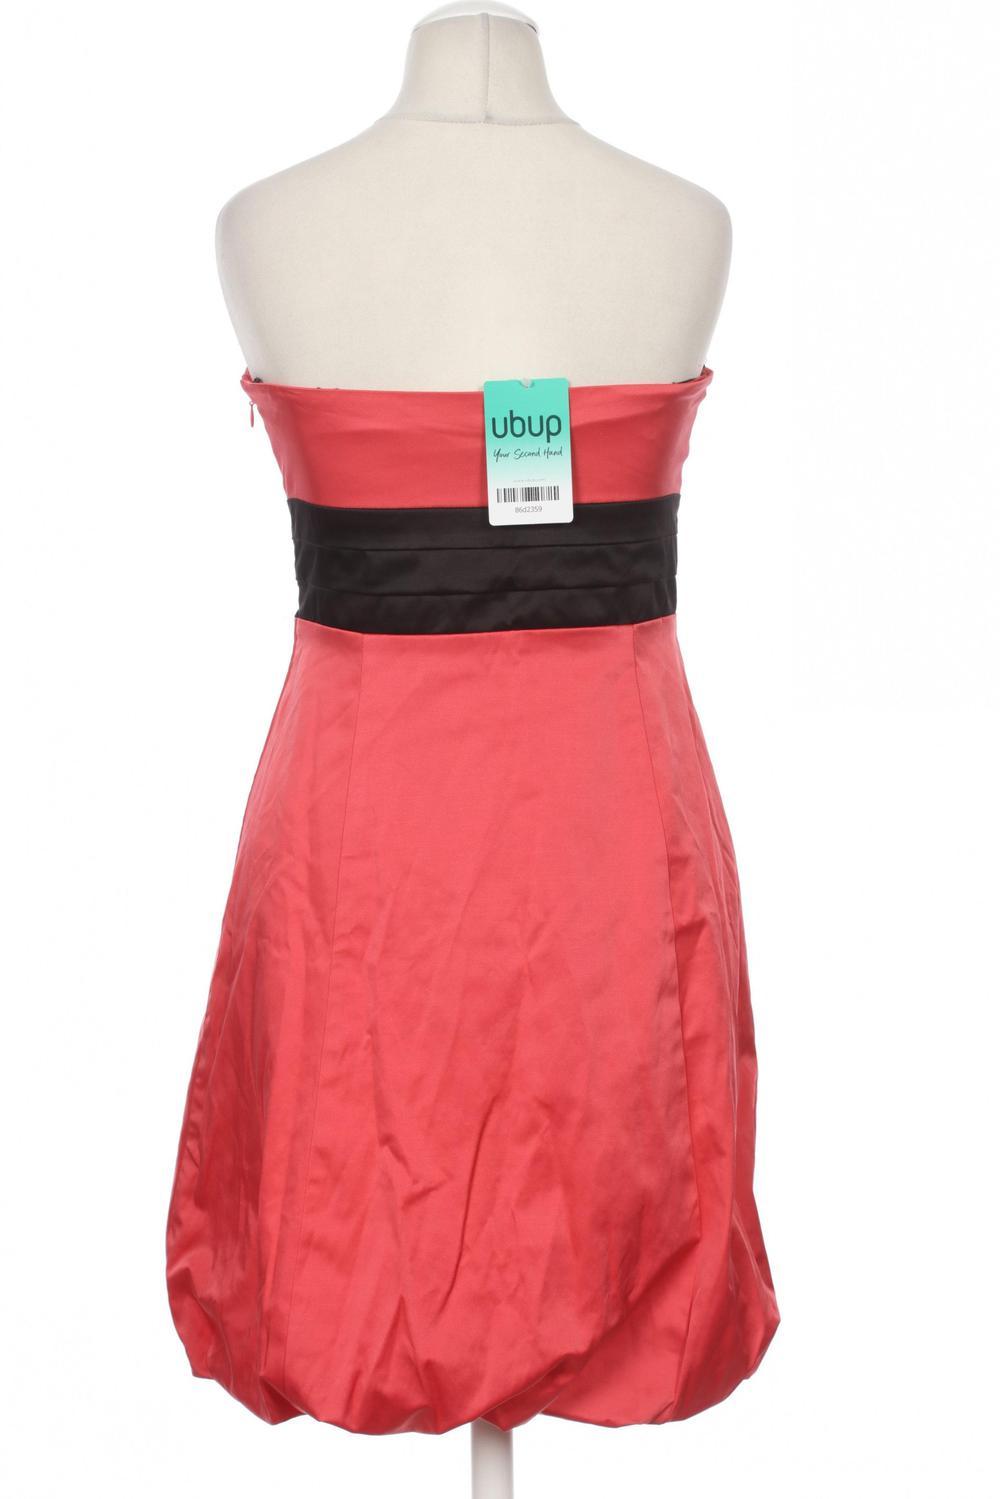 Vera Mont Damen Kleid DE 34 Second Hand kaufen | ubup